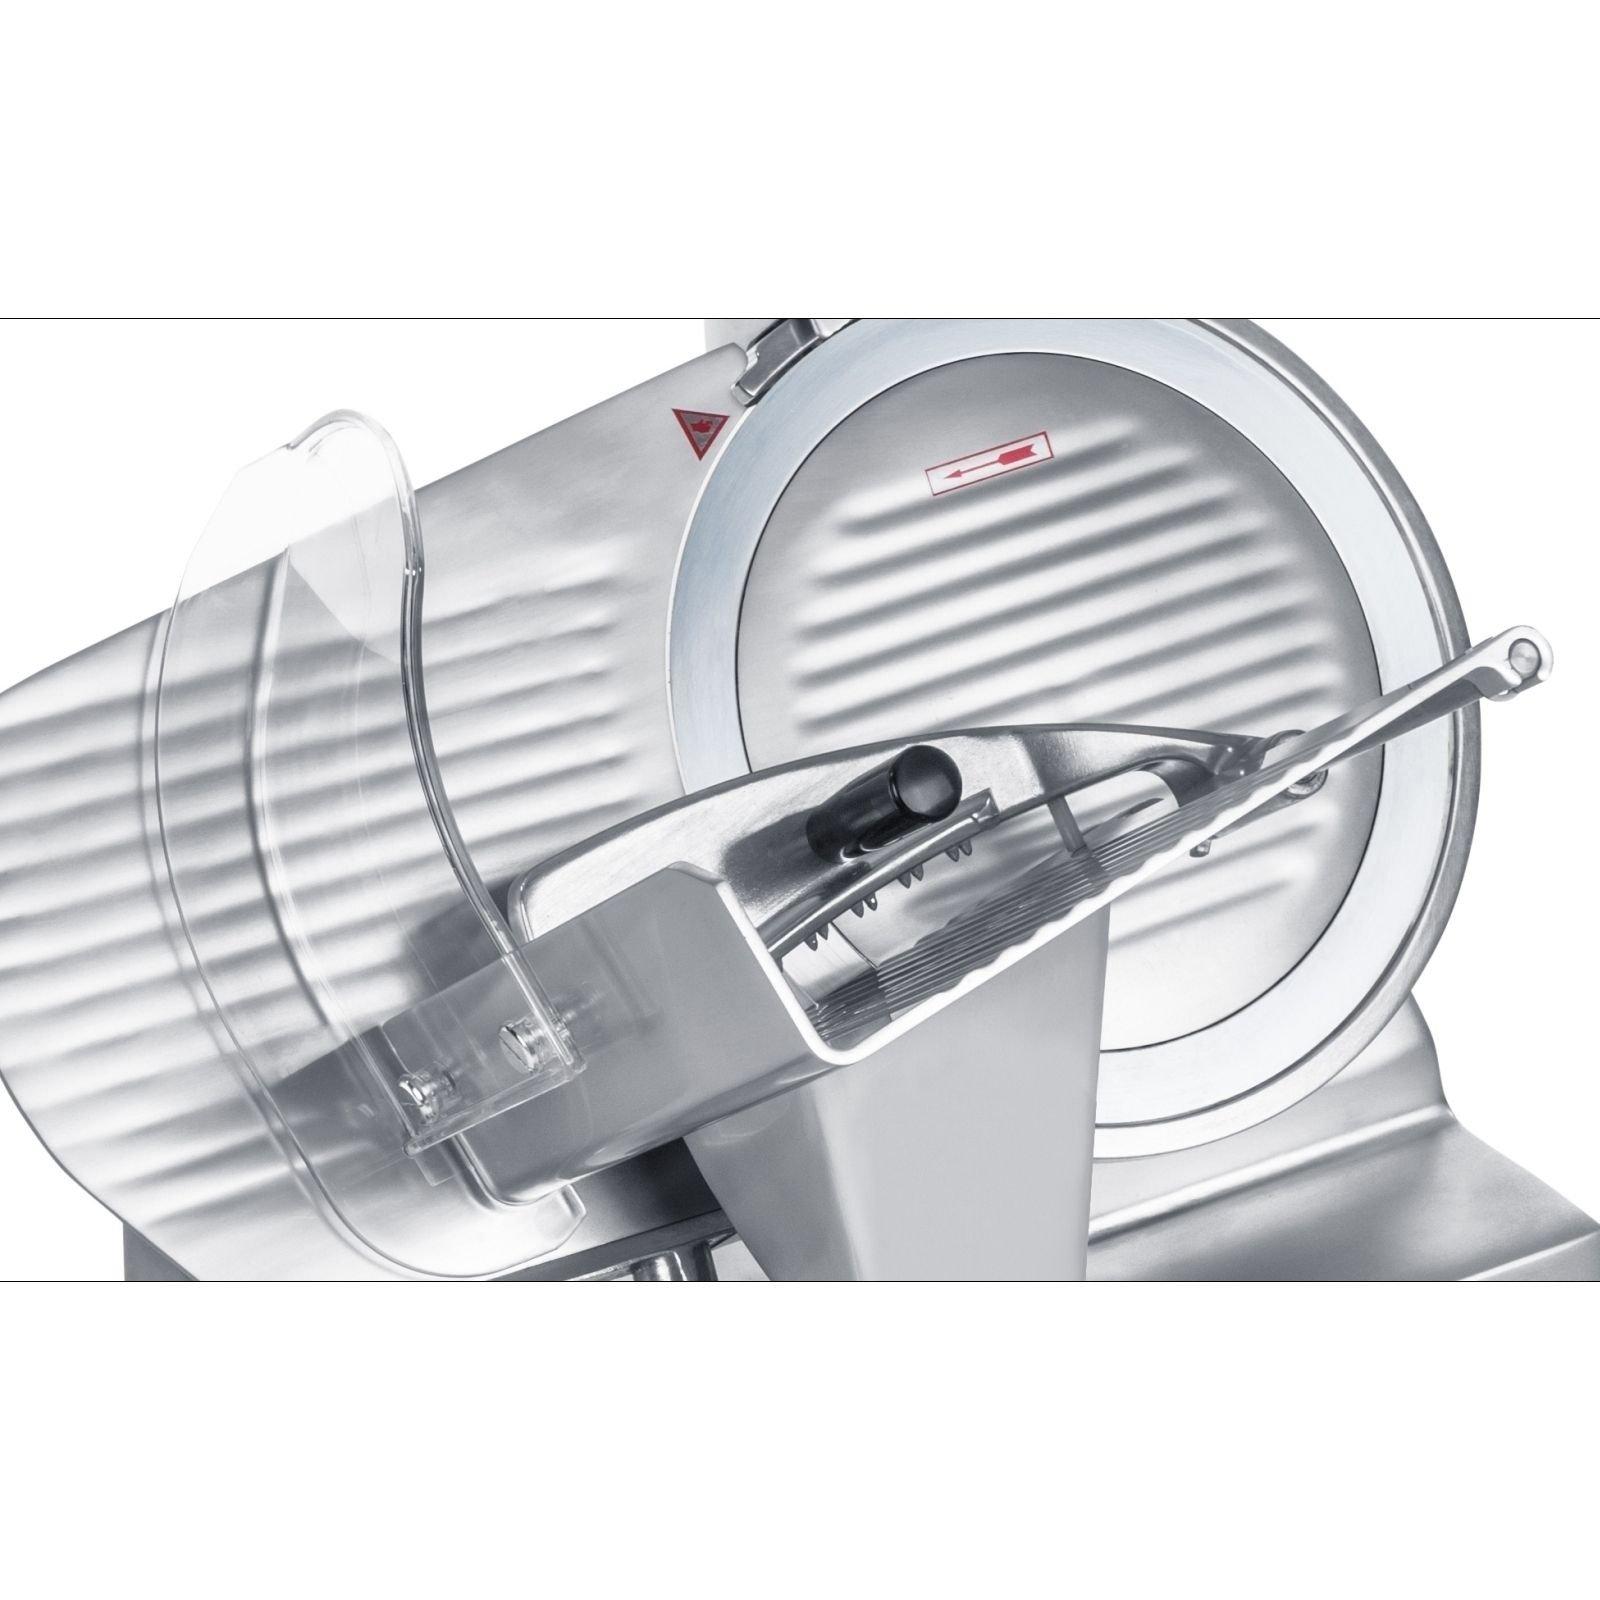 Con Afilador Integrado, Di/ámetro Cuchilla 220 mm, Grosor De Corte: 0-12 mm Royal Catering Cortafiambres M/áquina Para Carnicer/ía RCAM 220PRO